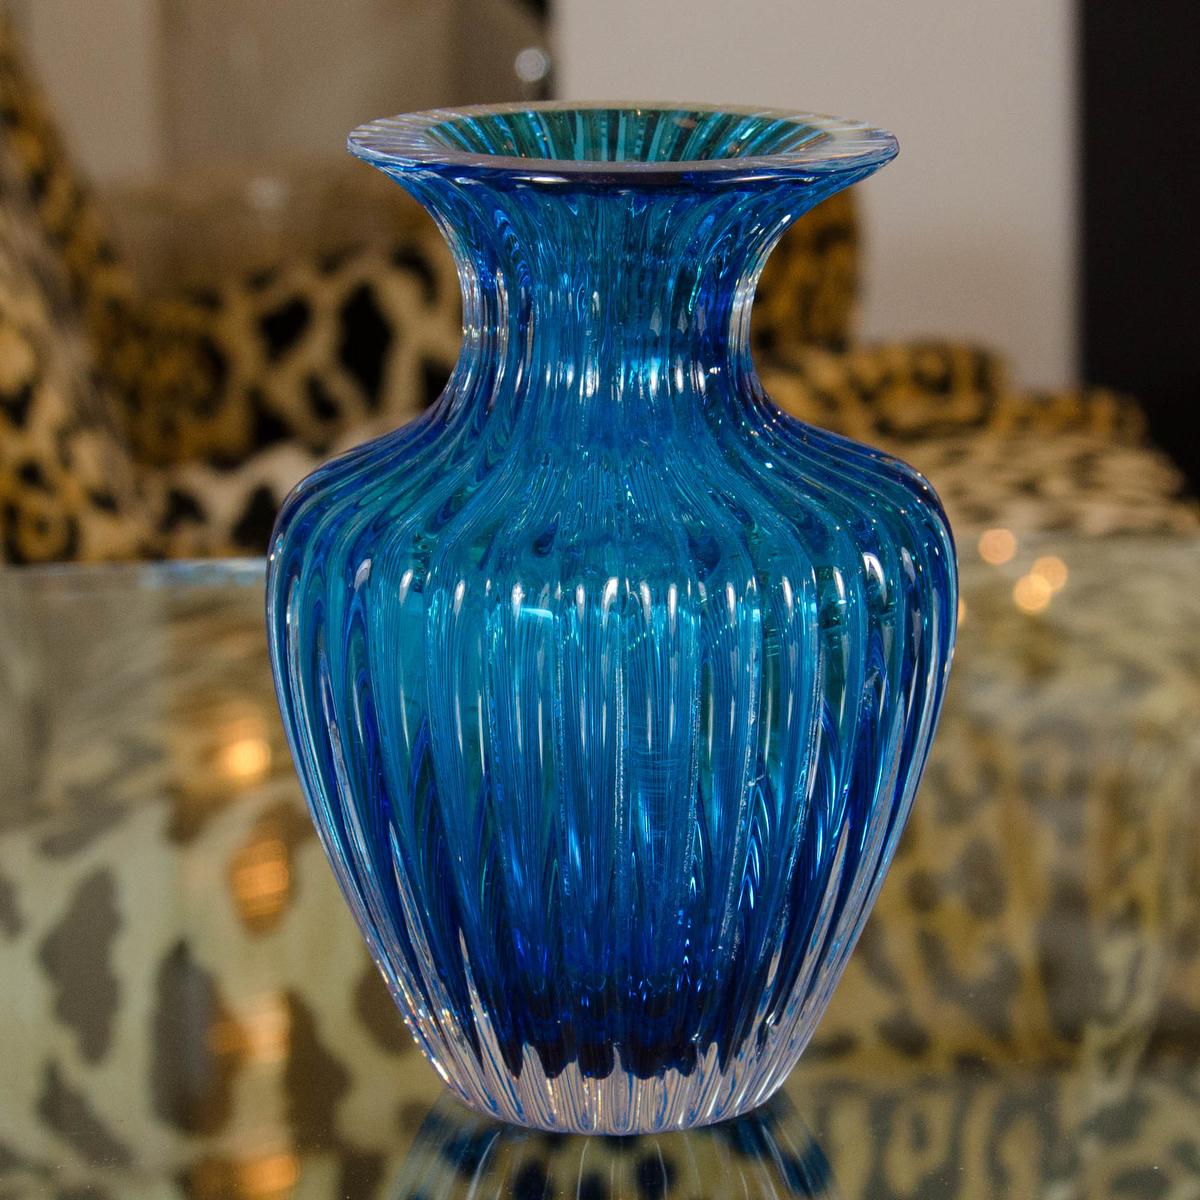 Turquoise Murano Glass Vase Vases John Salibello